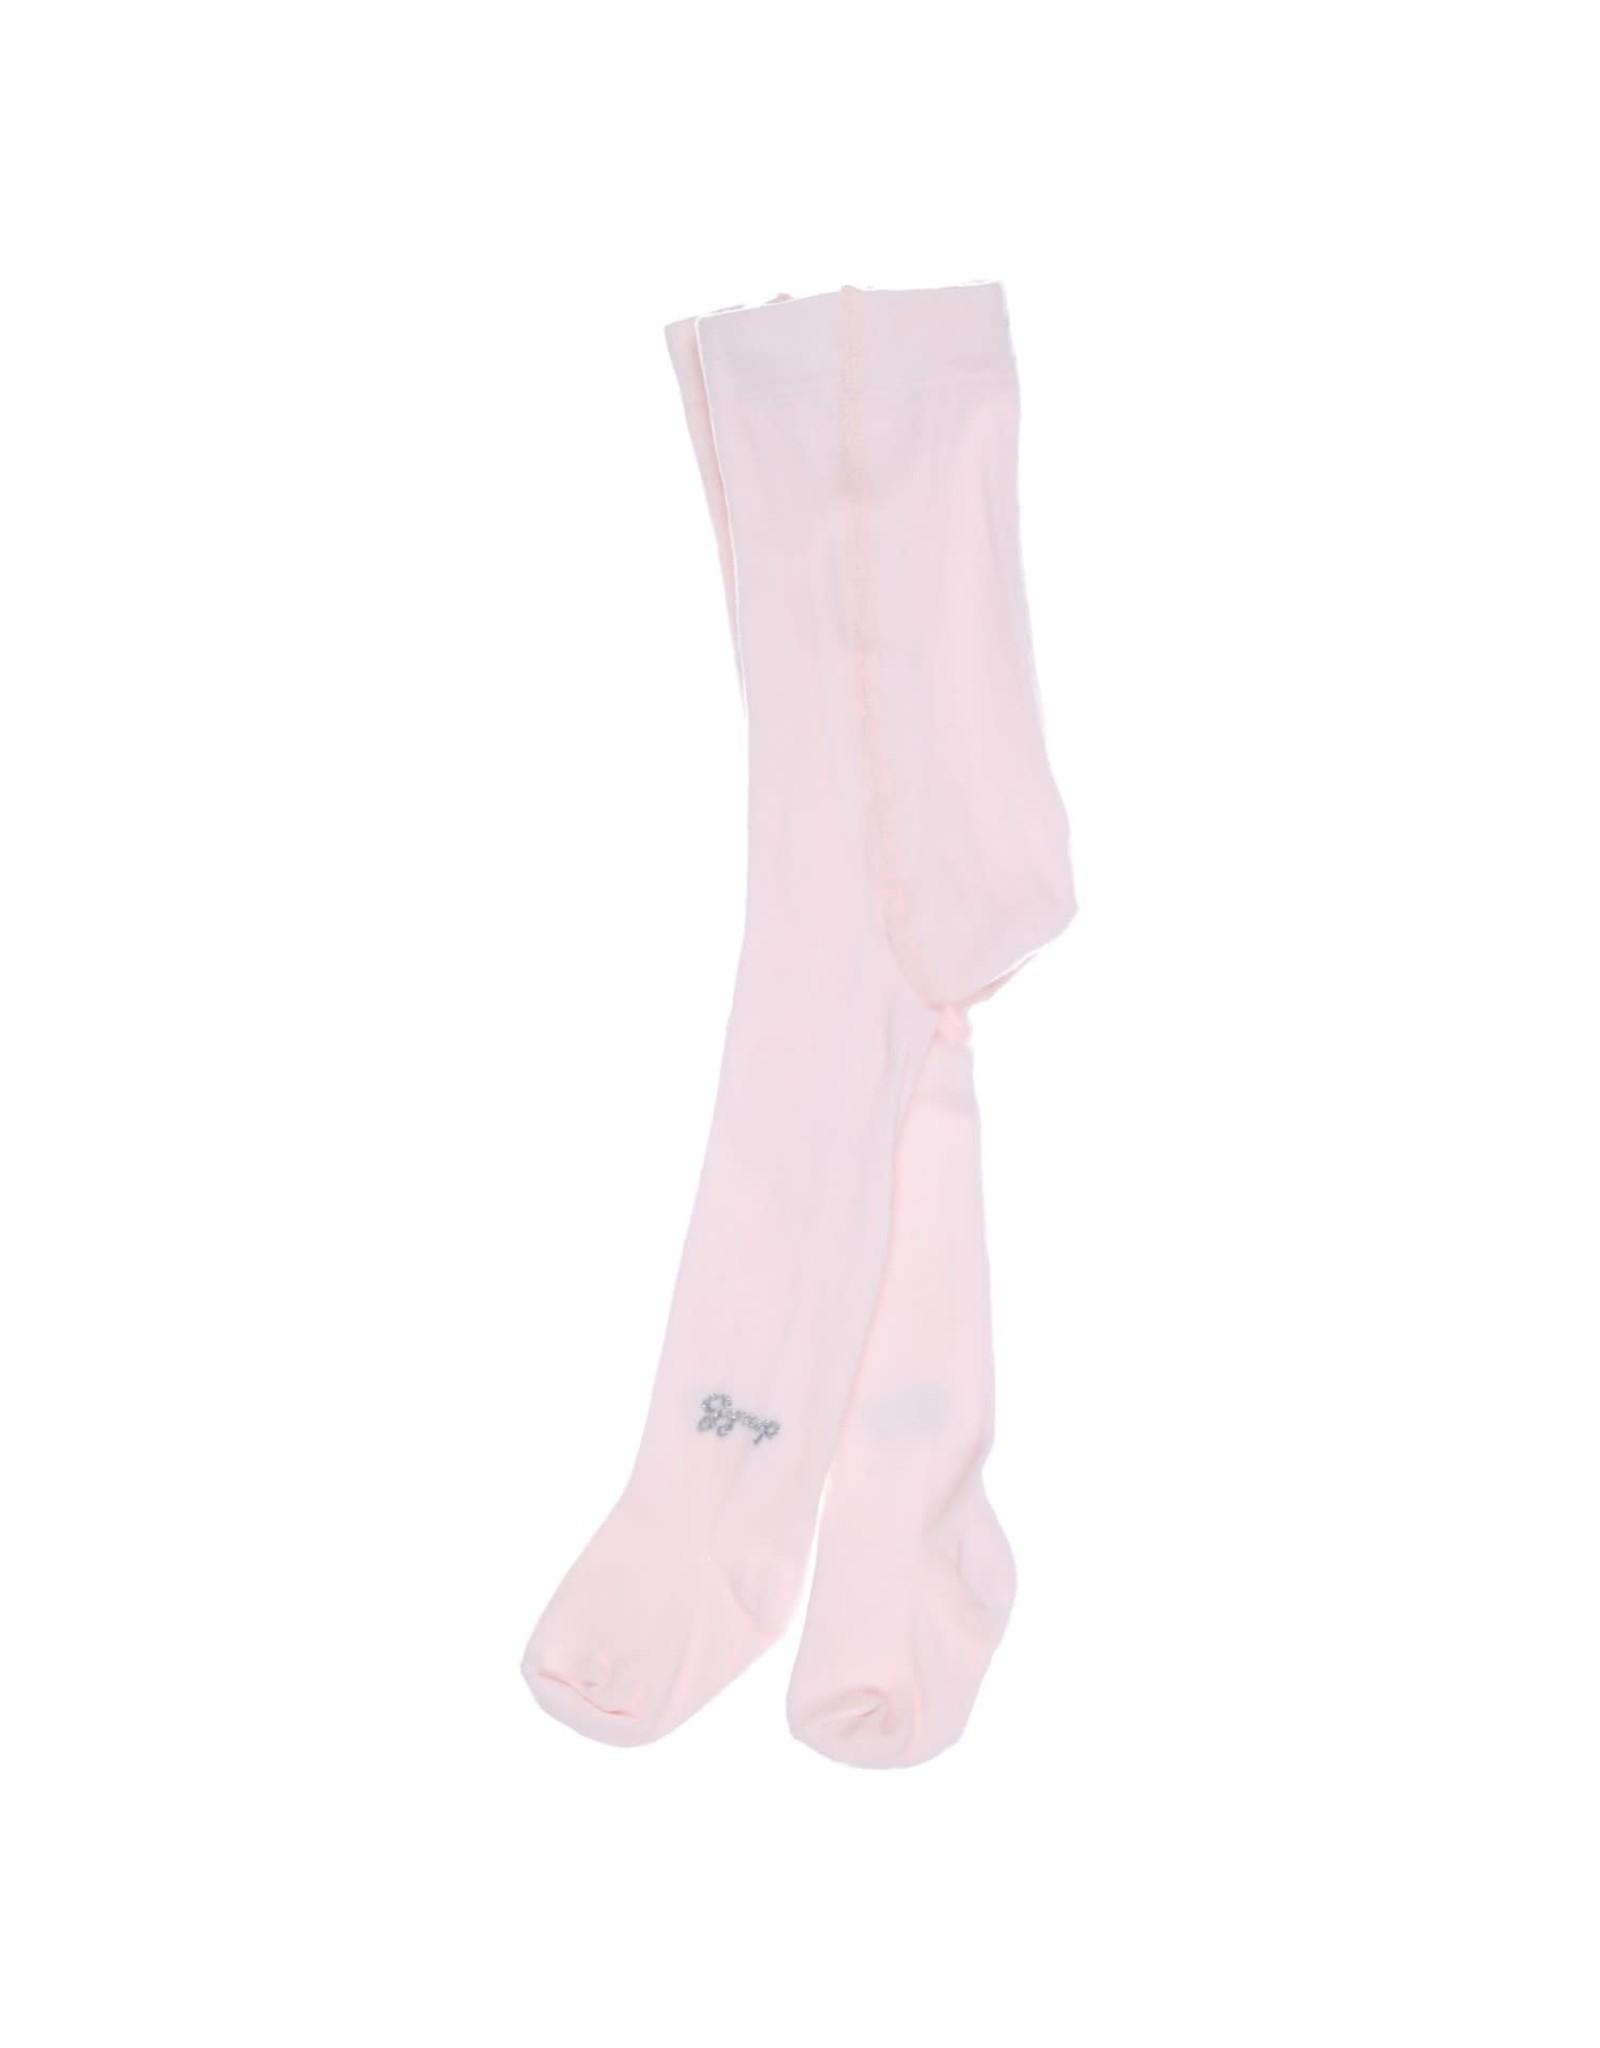 Gymp COLLANTS - girls tights - Prem LICHTROSE